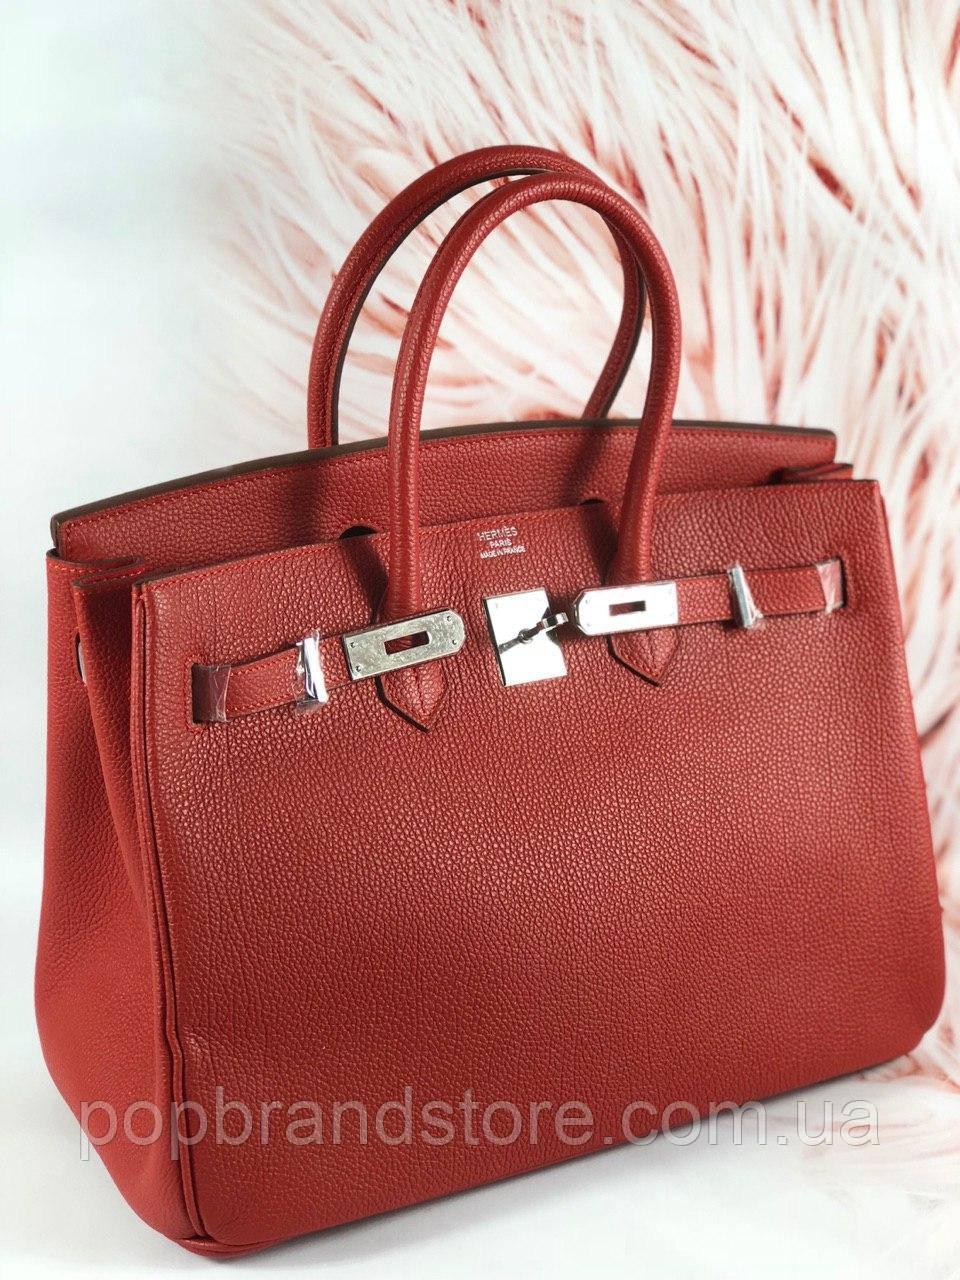 5ef173f5bbea Женская сумка Гермес Биркин 35 см (реплика) - Pop Brand Store   брендовые  сумки